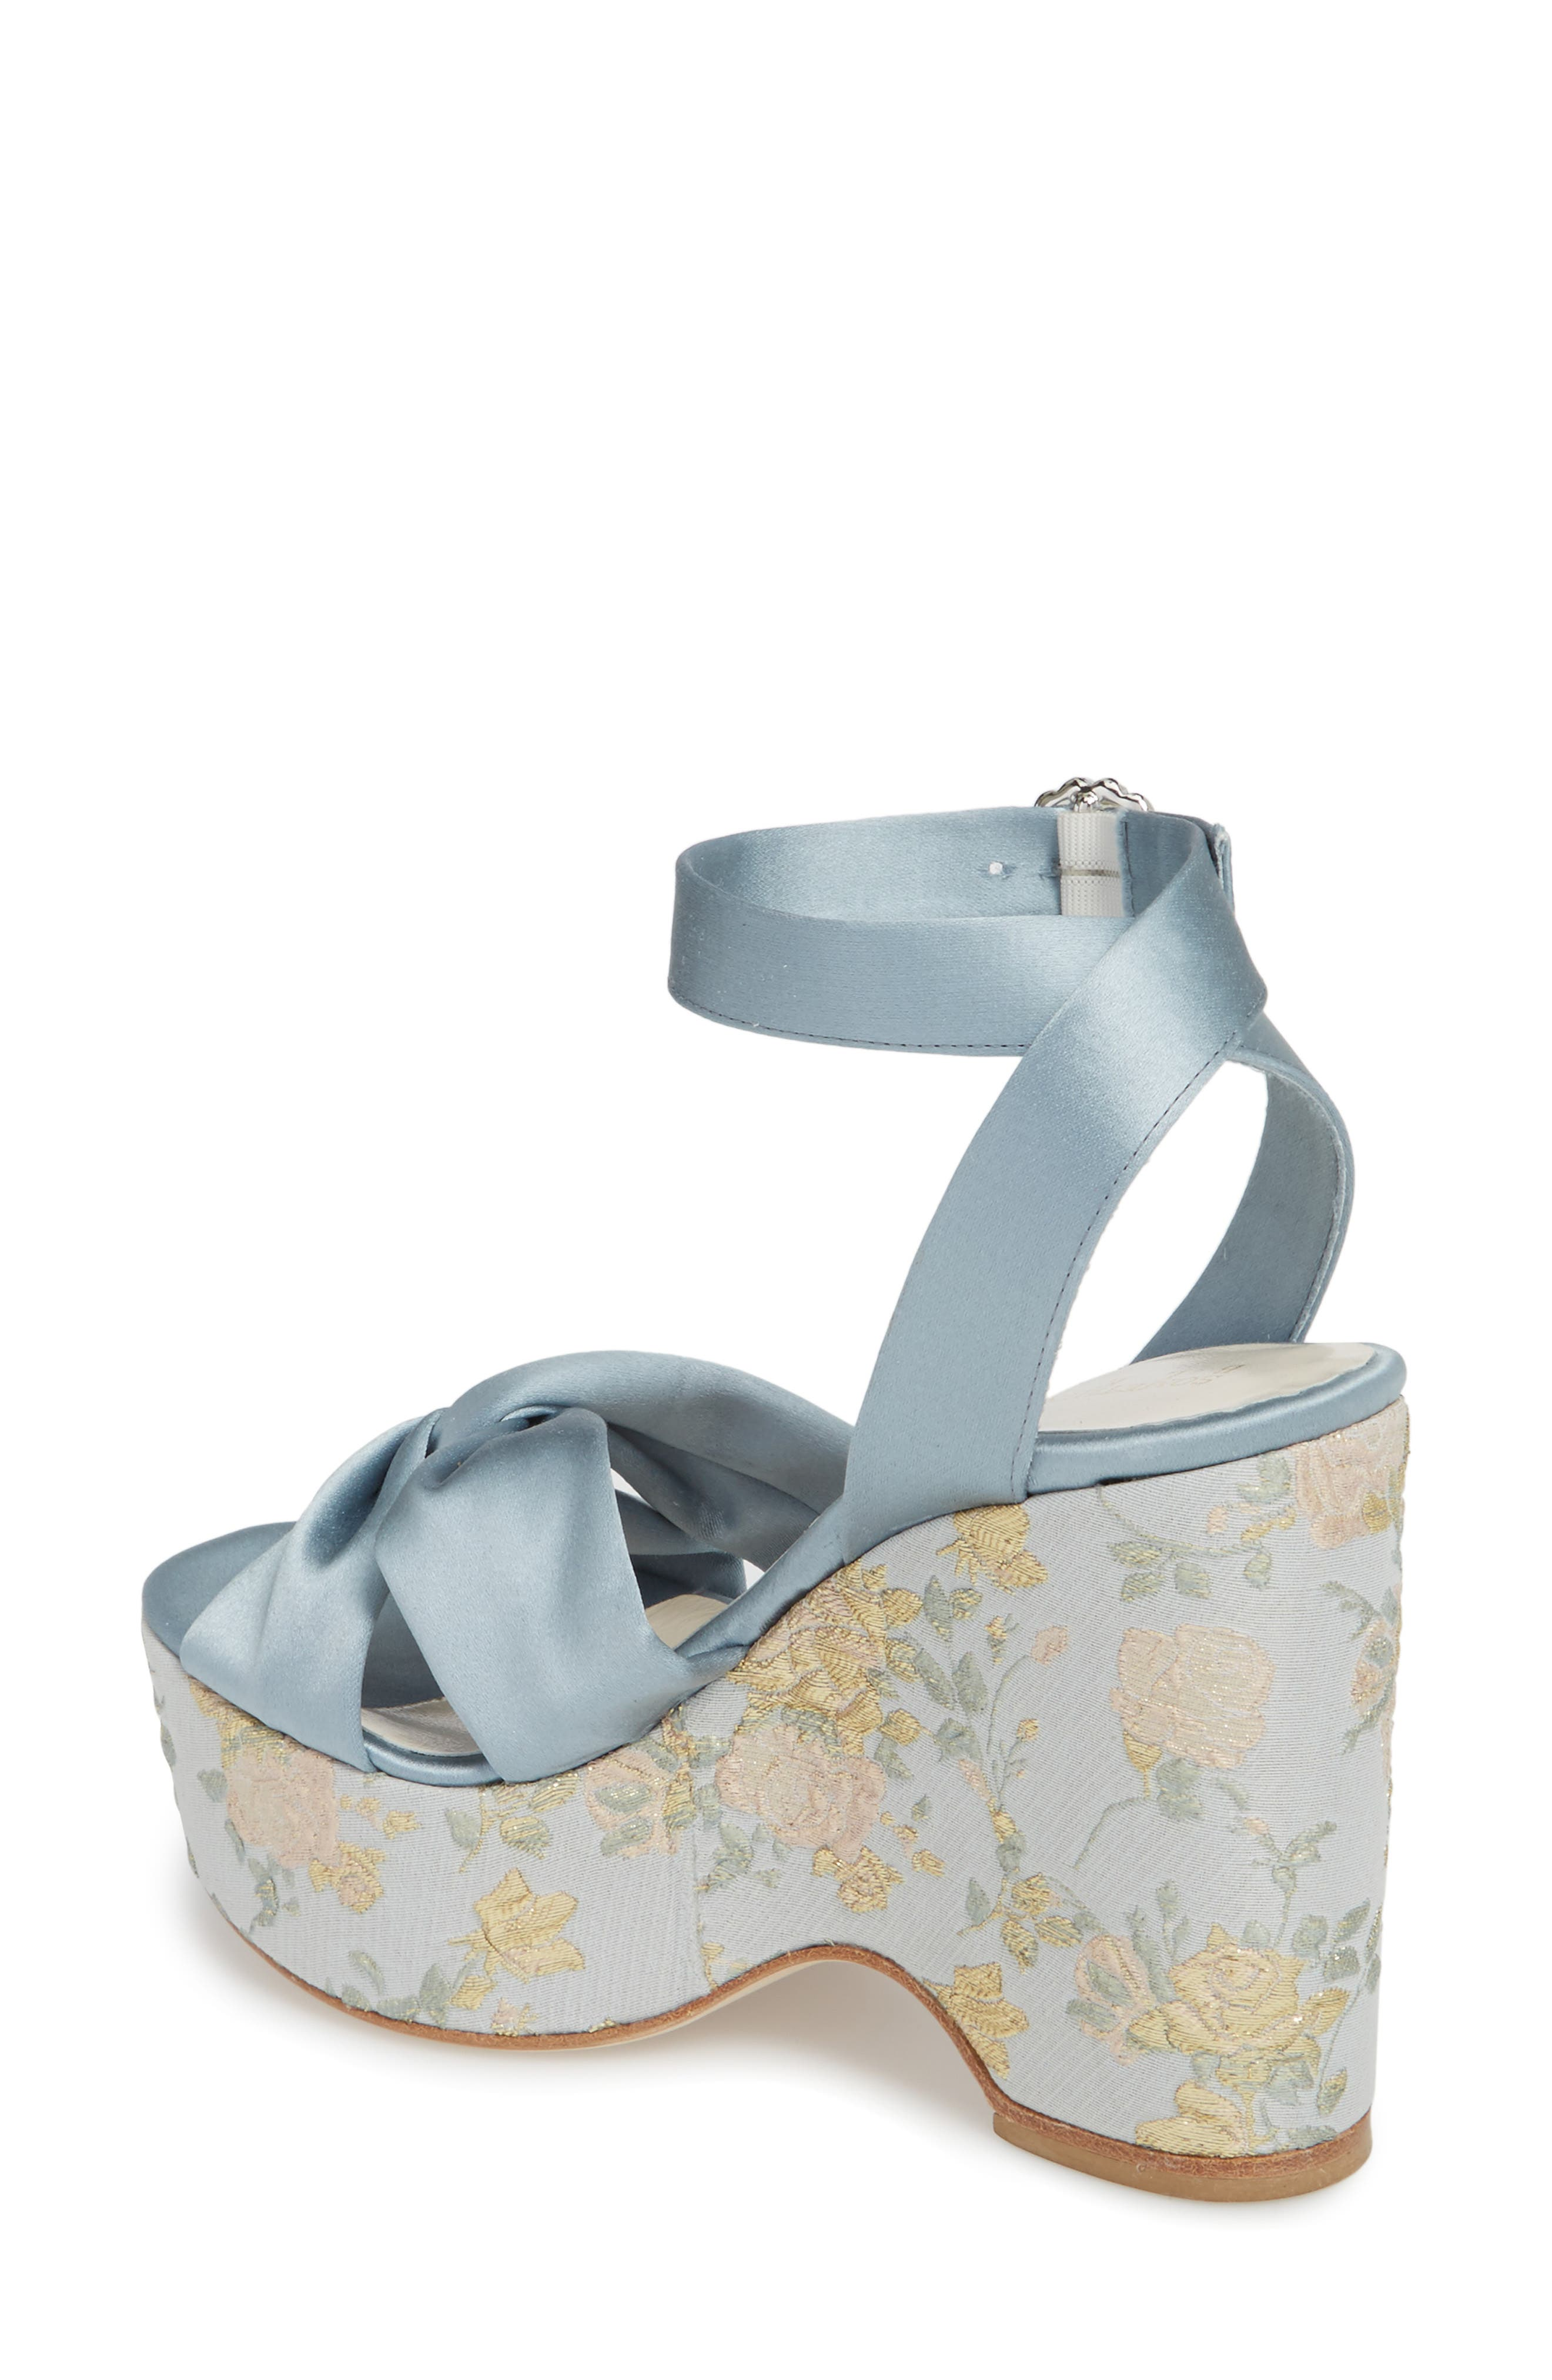 Serena Brocade Platform Sandal,                             Alternate thumbnail 2, color,                             Pearl Blue Satin